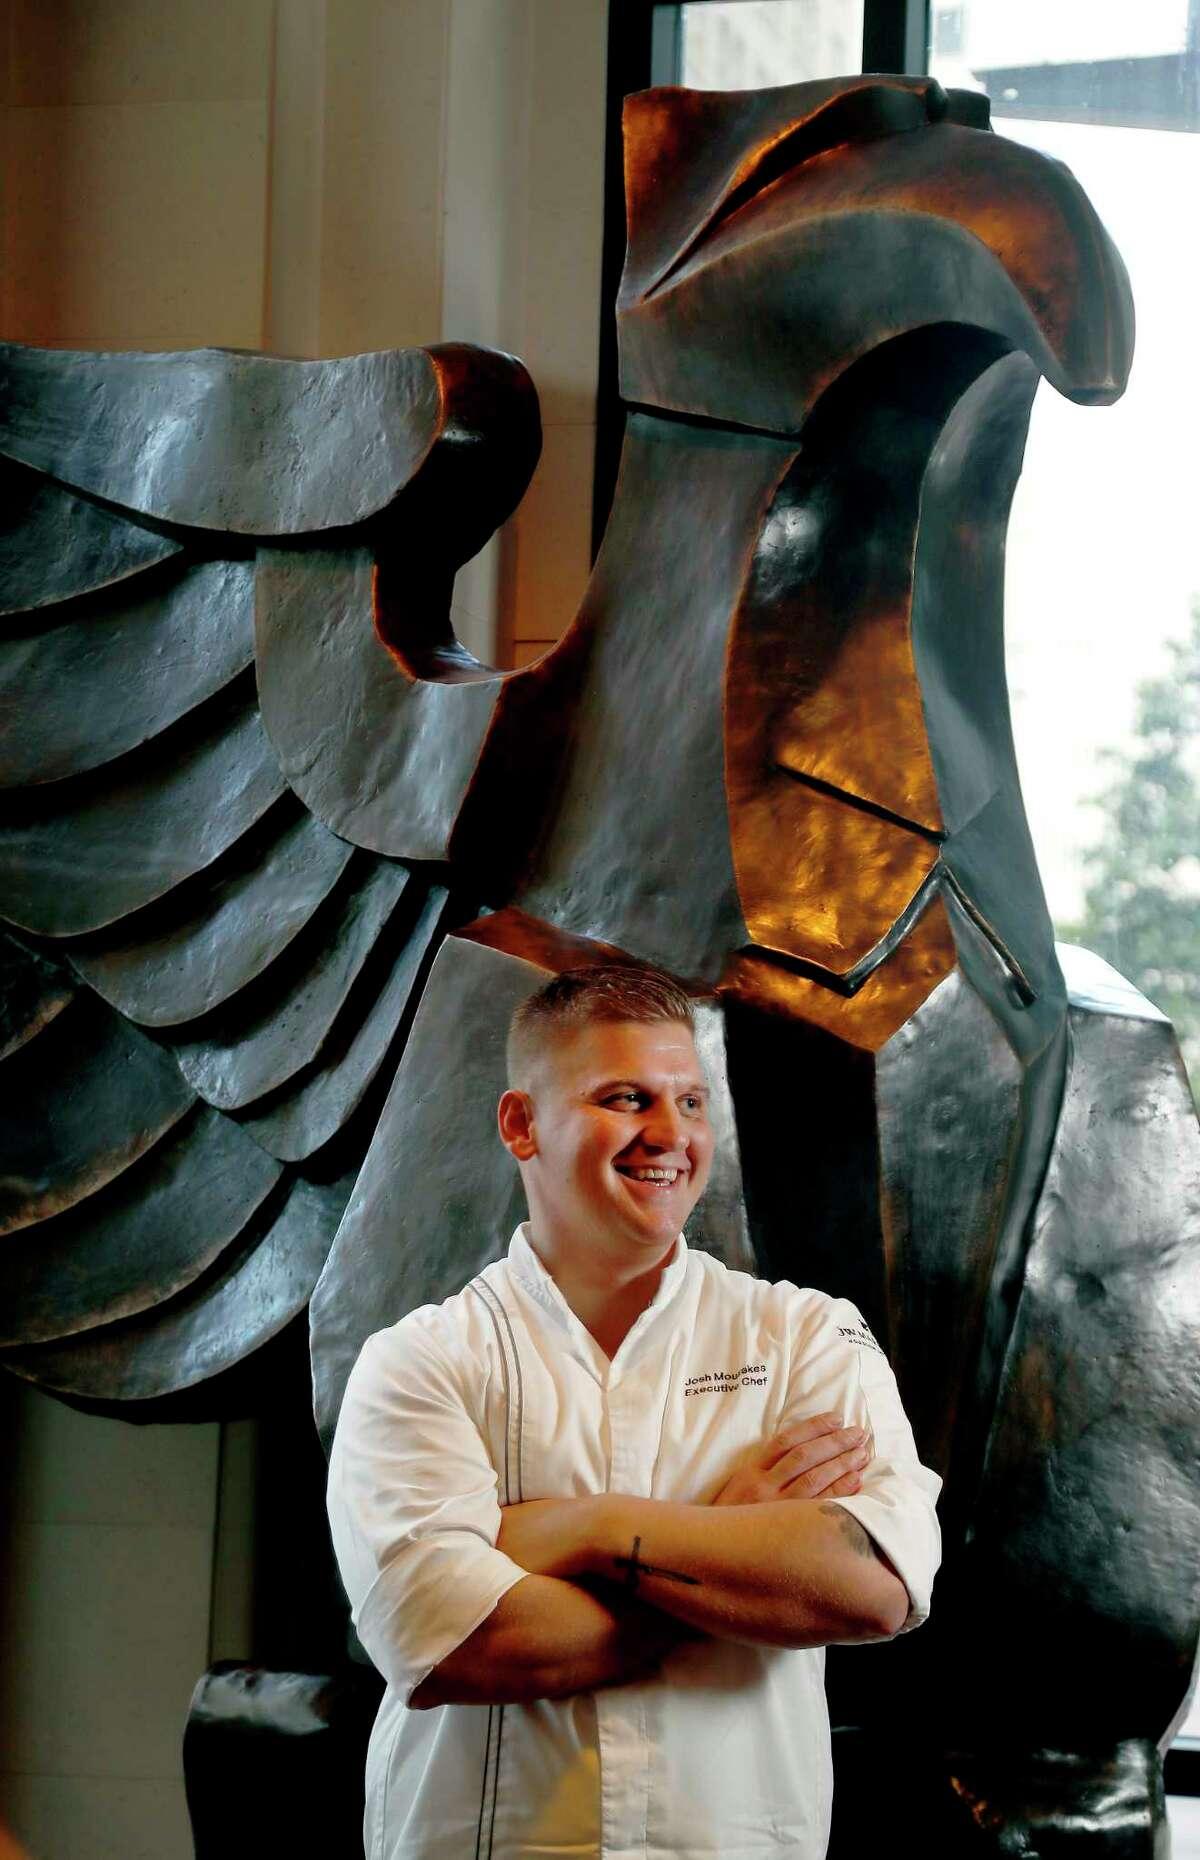 Josh Mouzakes is the new executive chef at Main Kitchen, the JW Marriott Houston Downtown.